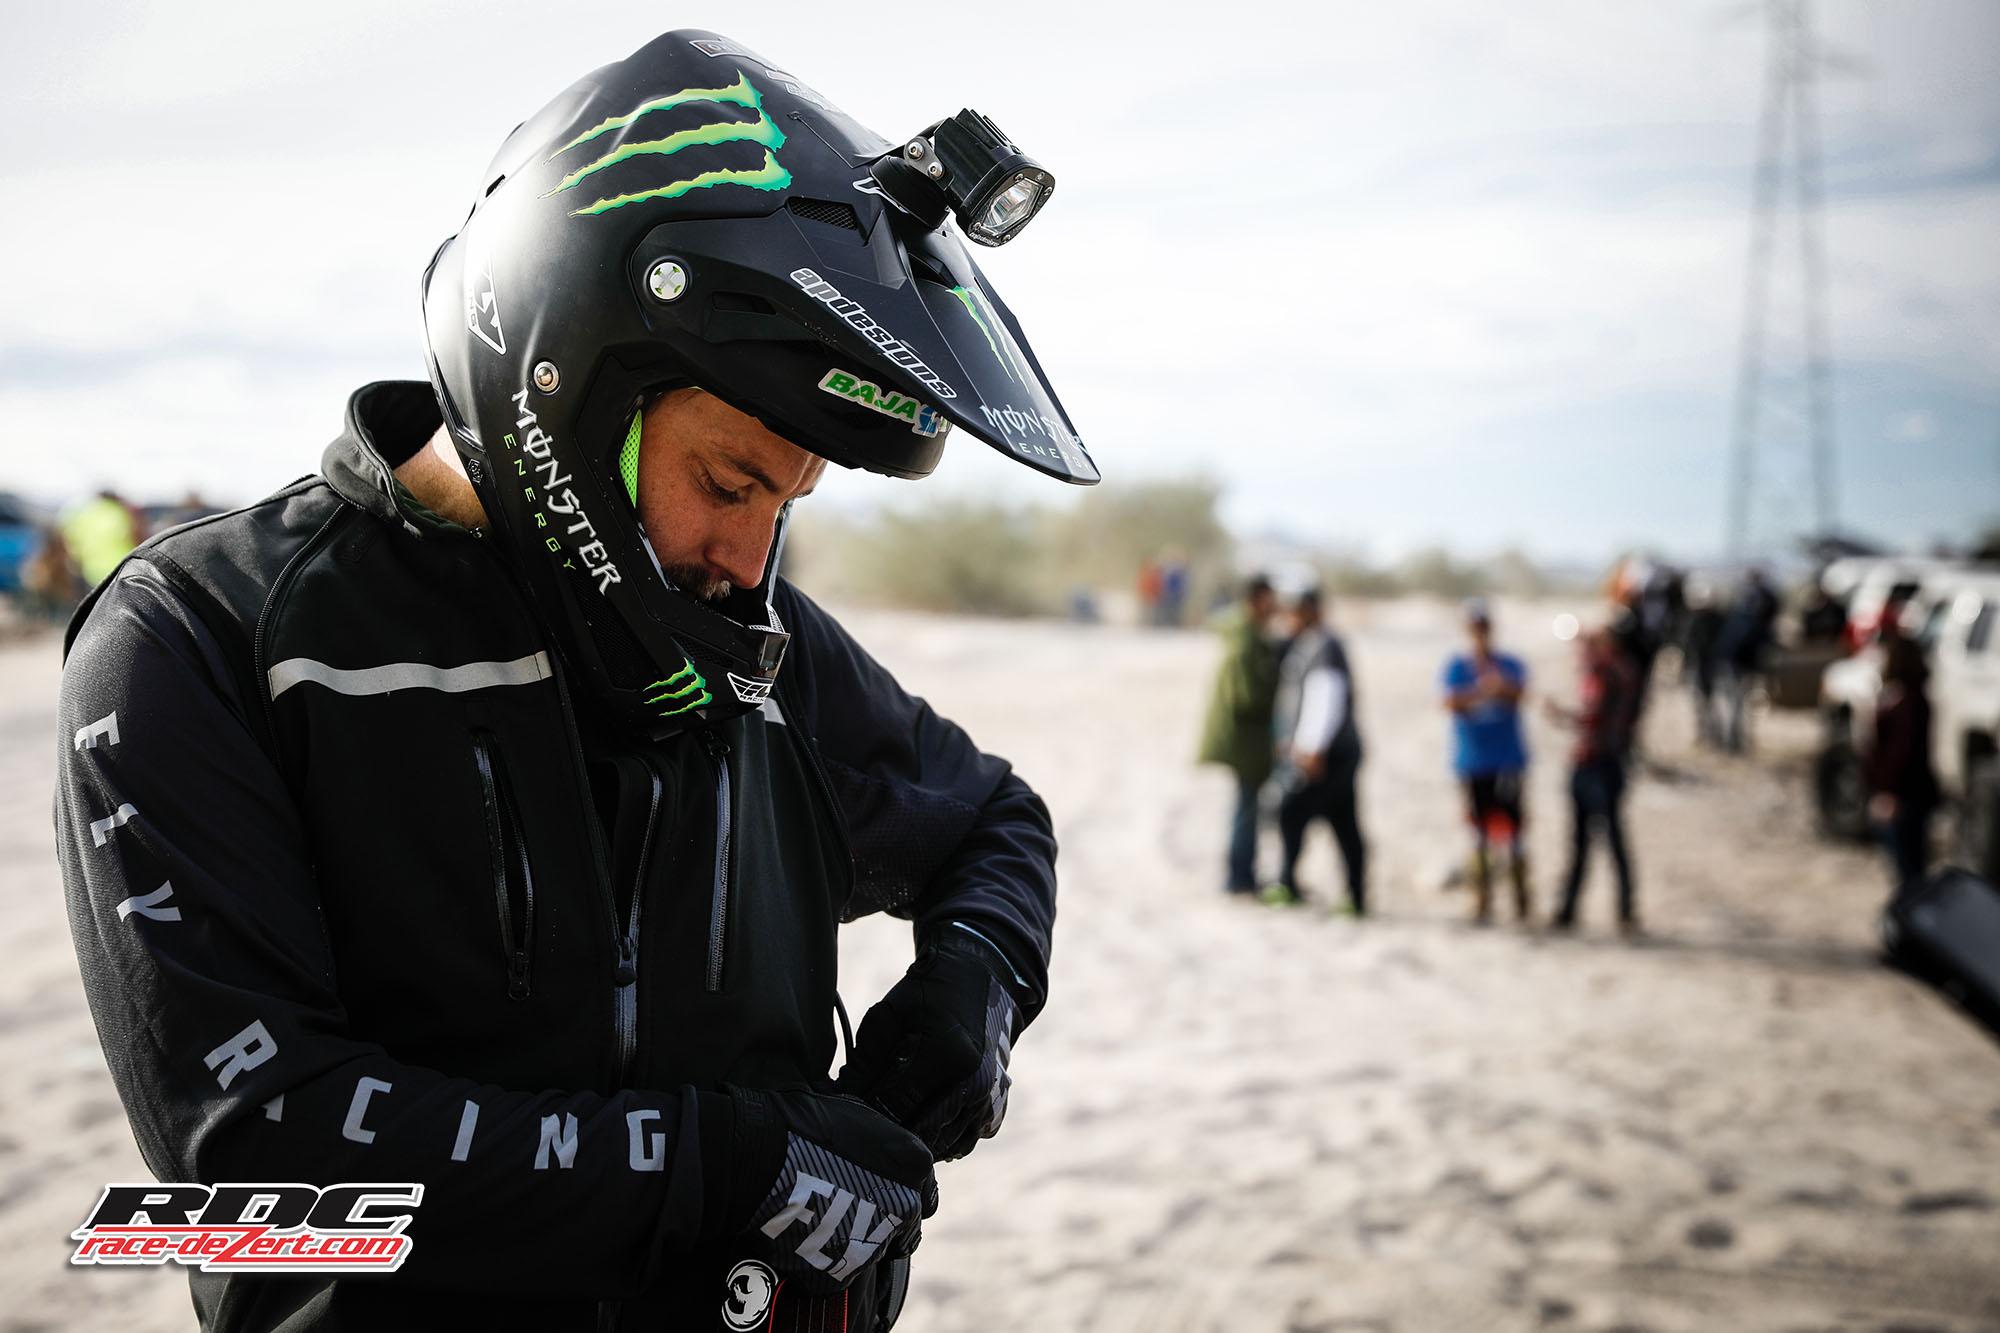 2019-score-baja1000-1x-westx1000-race-dezert-003.jpg